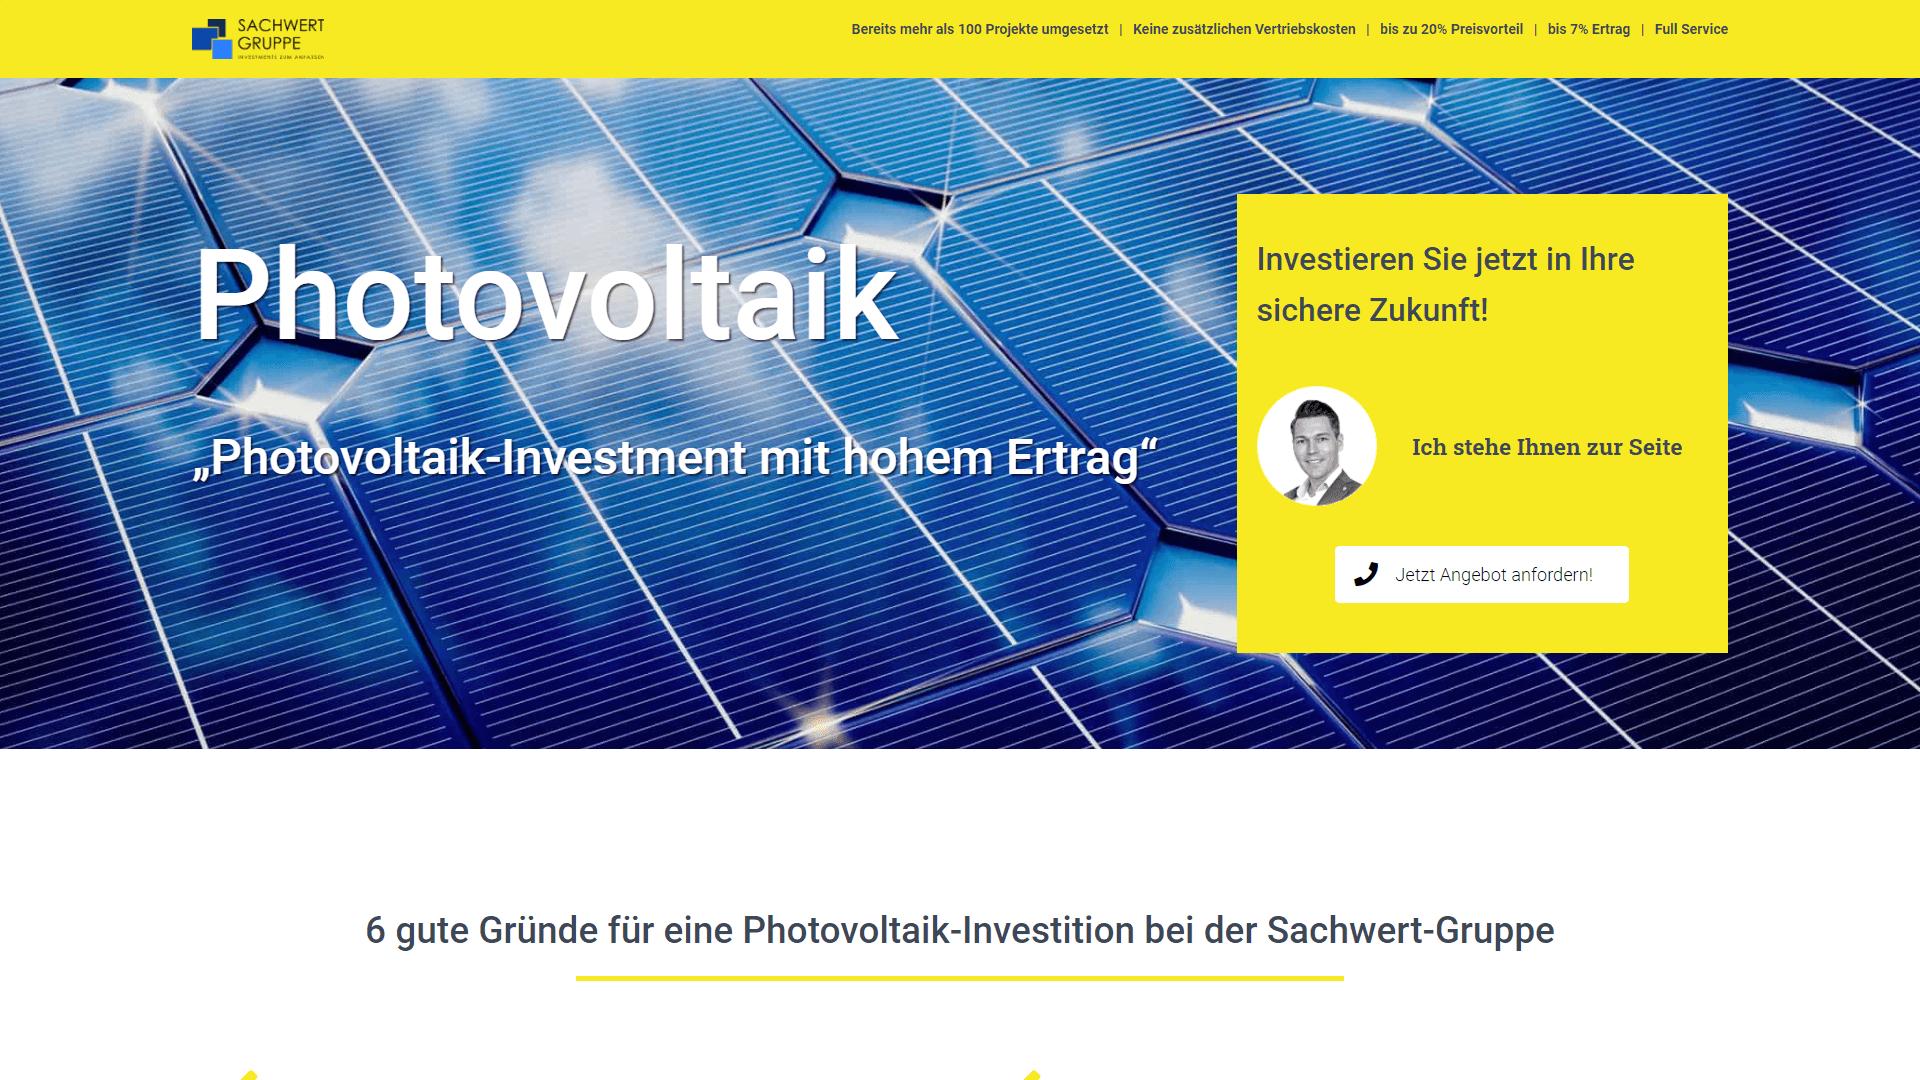 Referenz Sachwert Gruppe Photovoltaik Investment